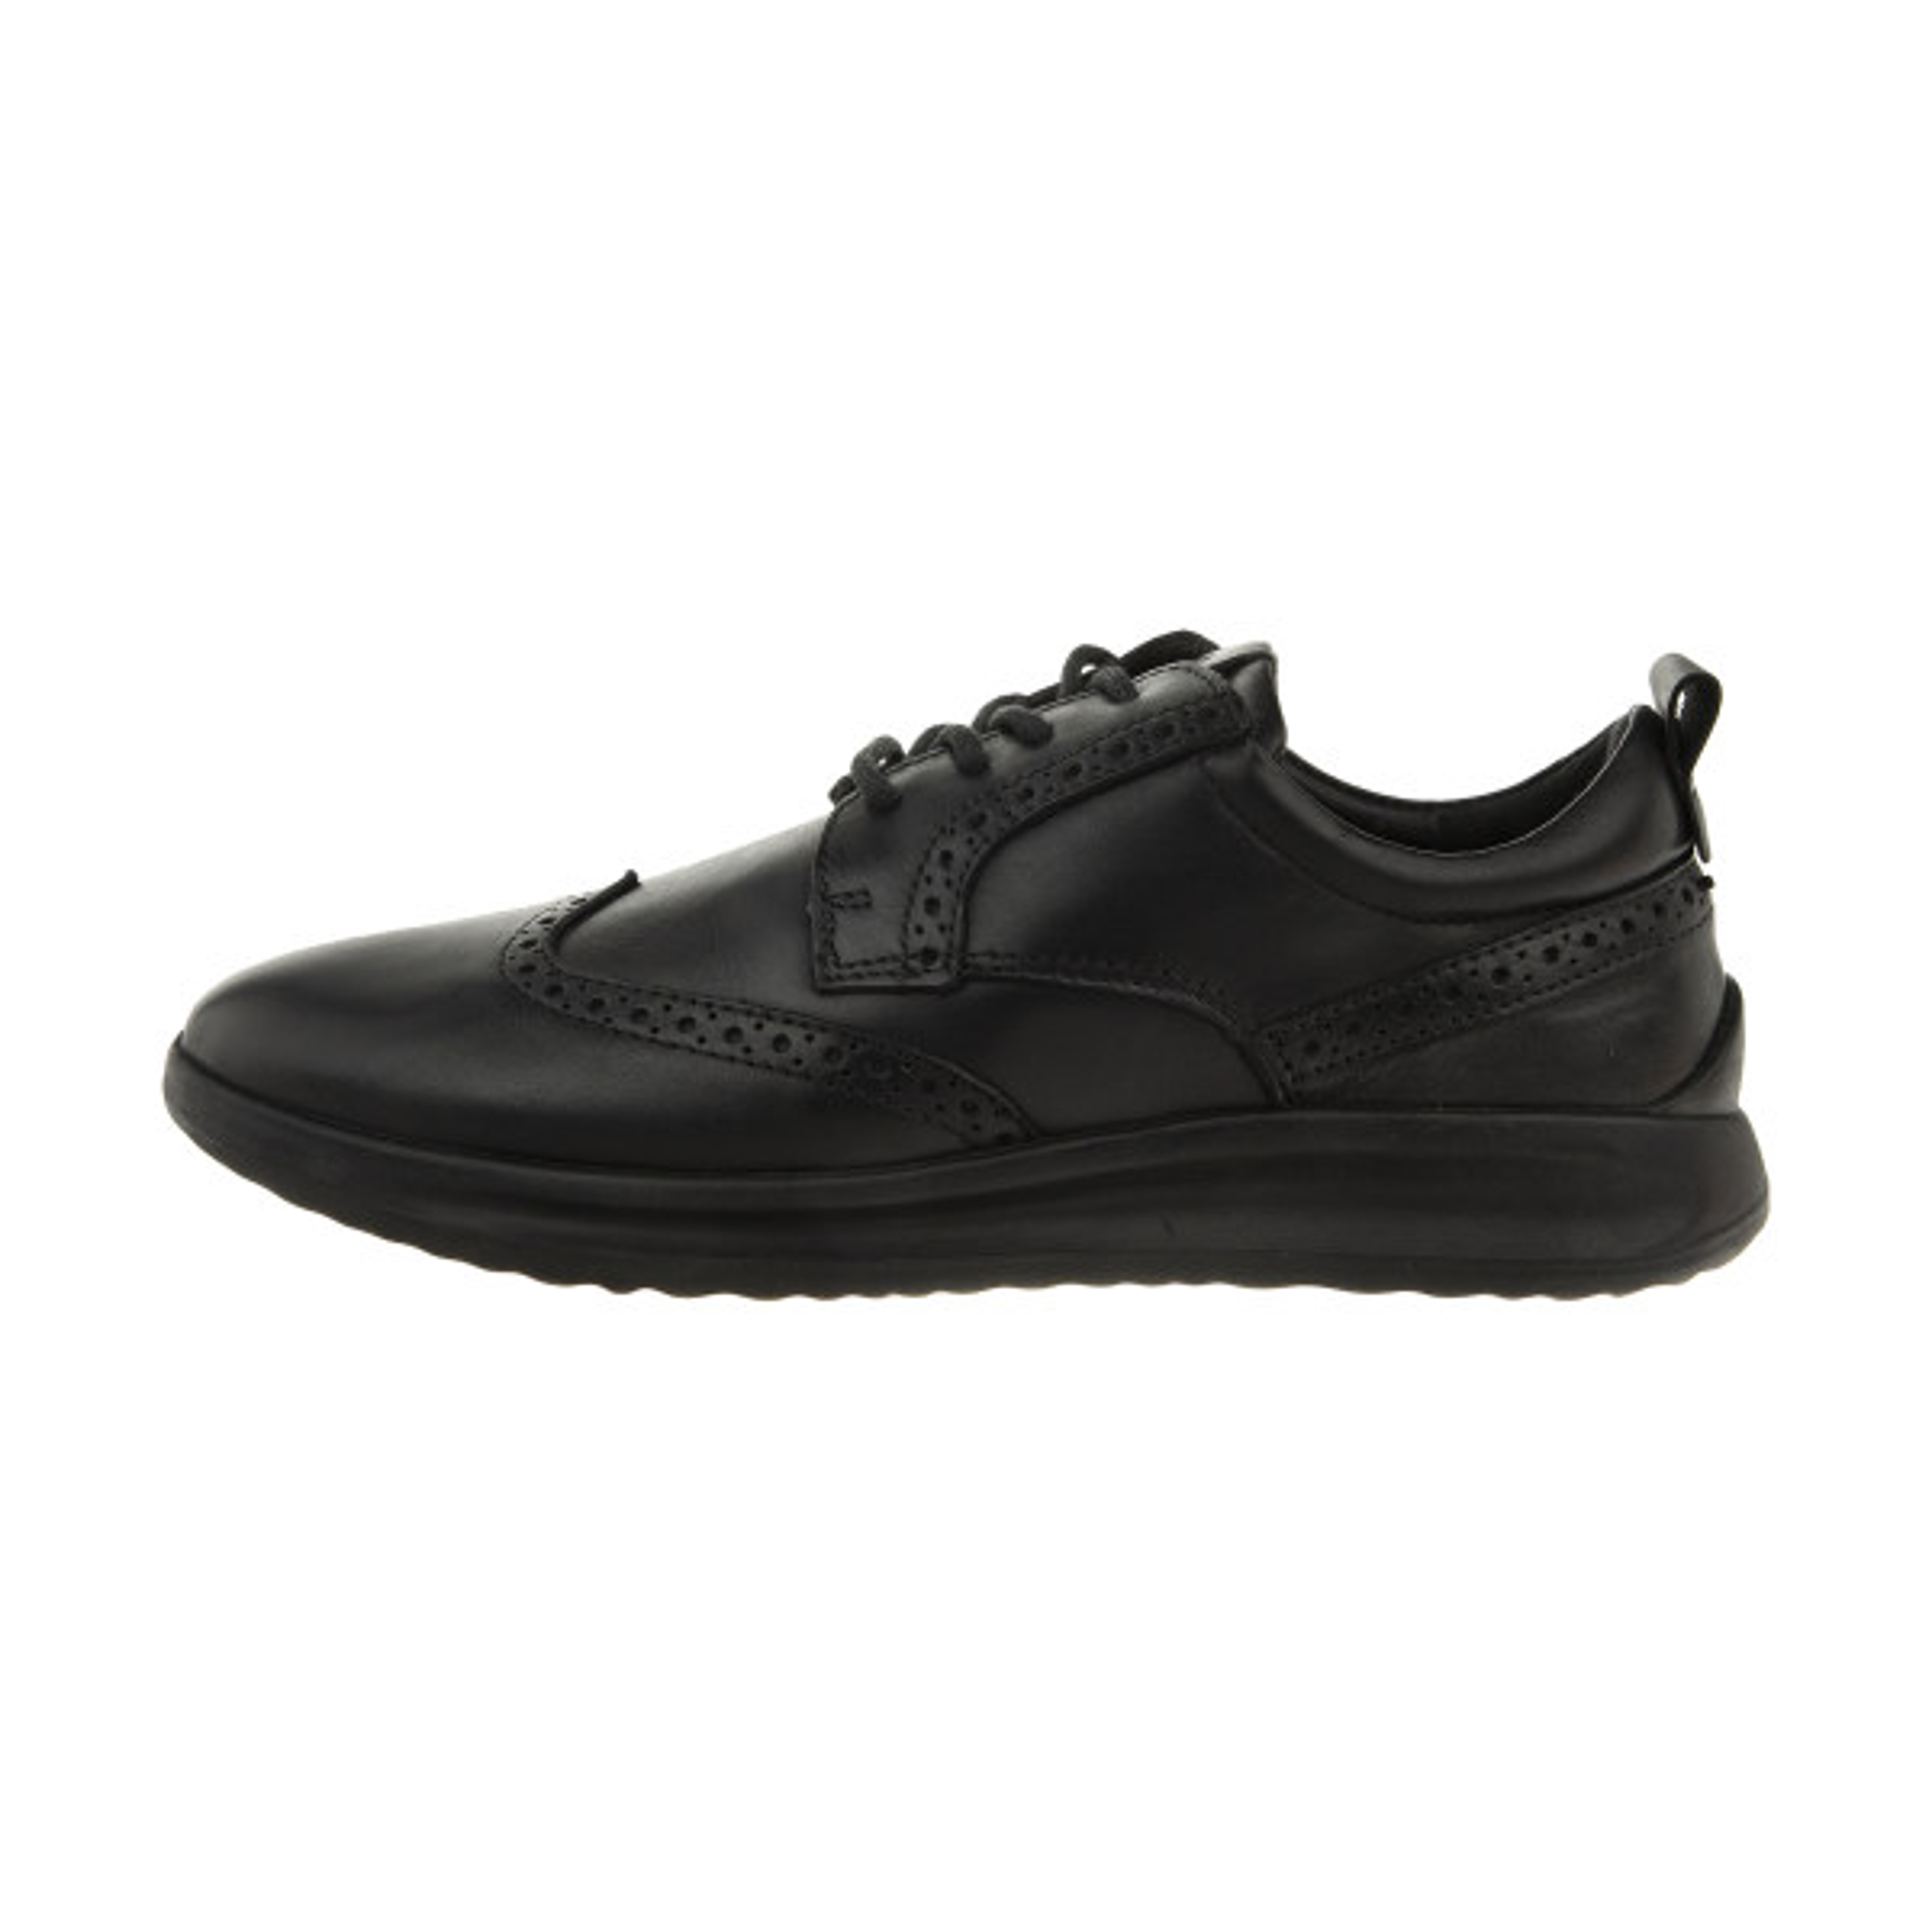 کفش روزمره مردانه اکو كد 64000401001